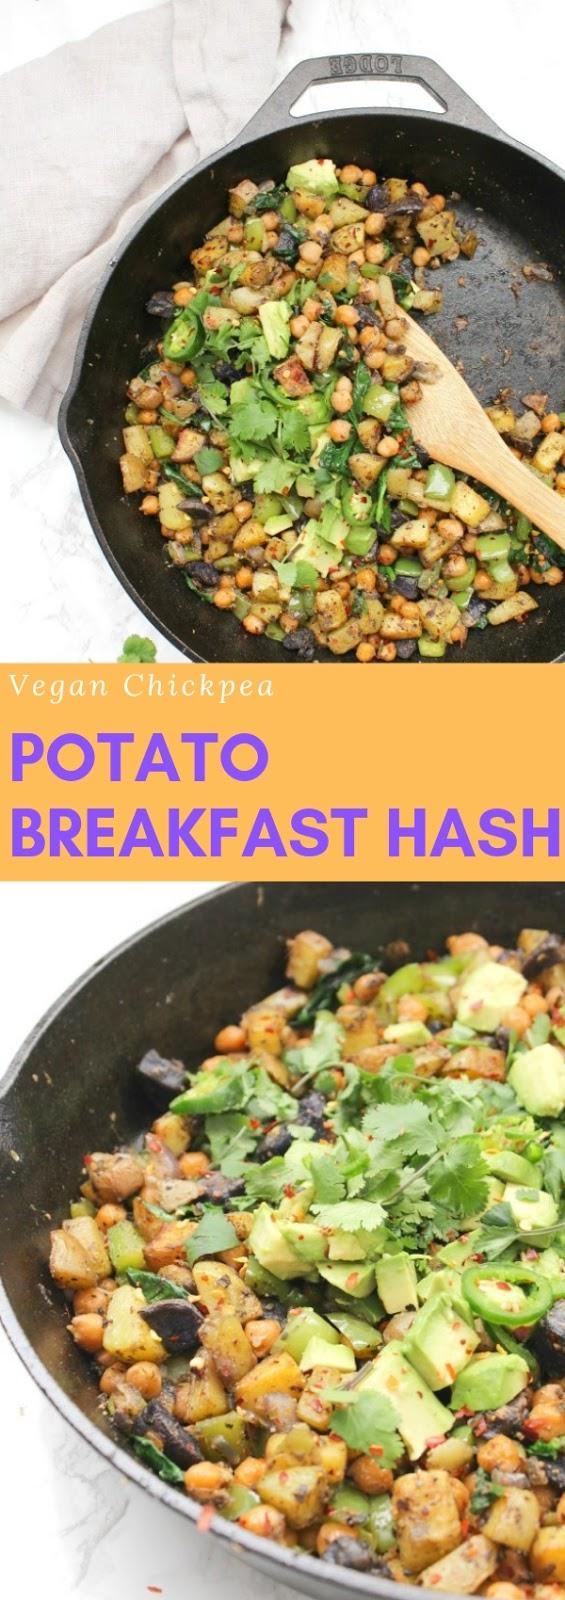 Vegan Chickpea Potato Breakfast Hash #healthy #vegan #chikpea #potato #breakfast #hash